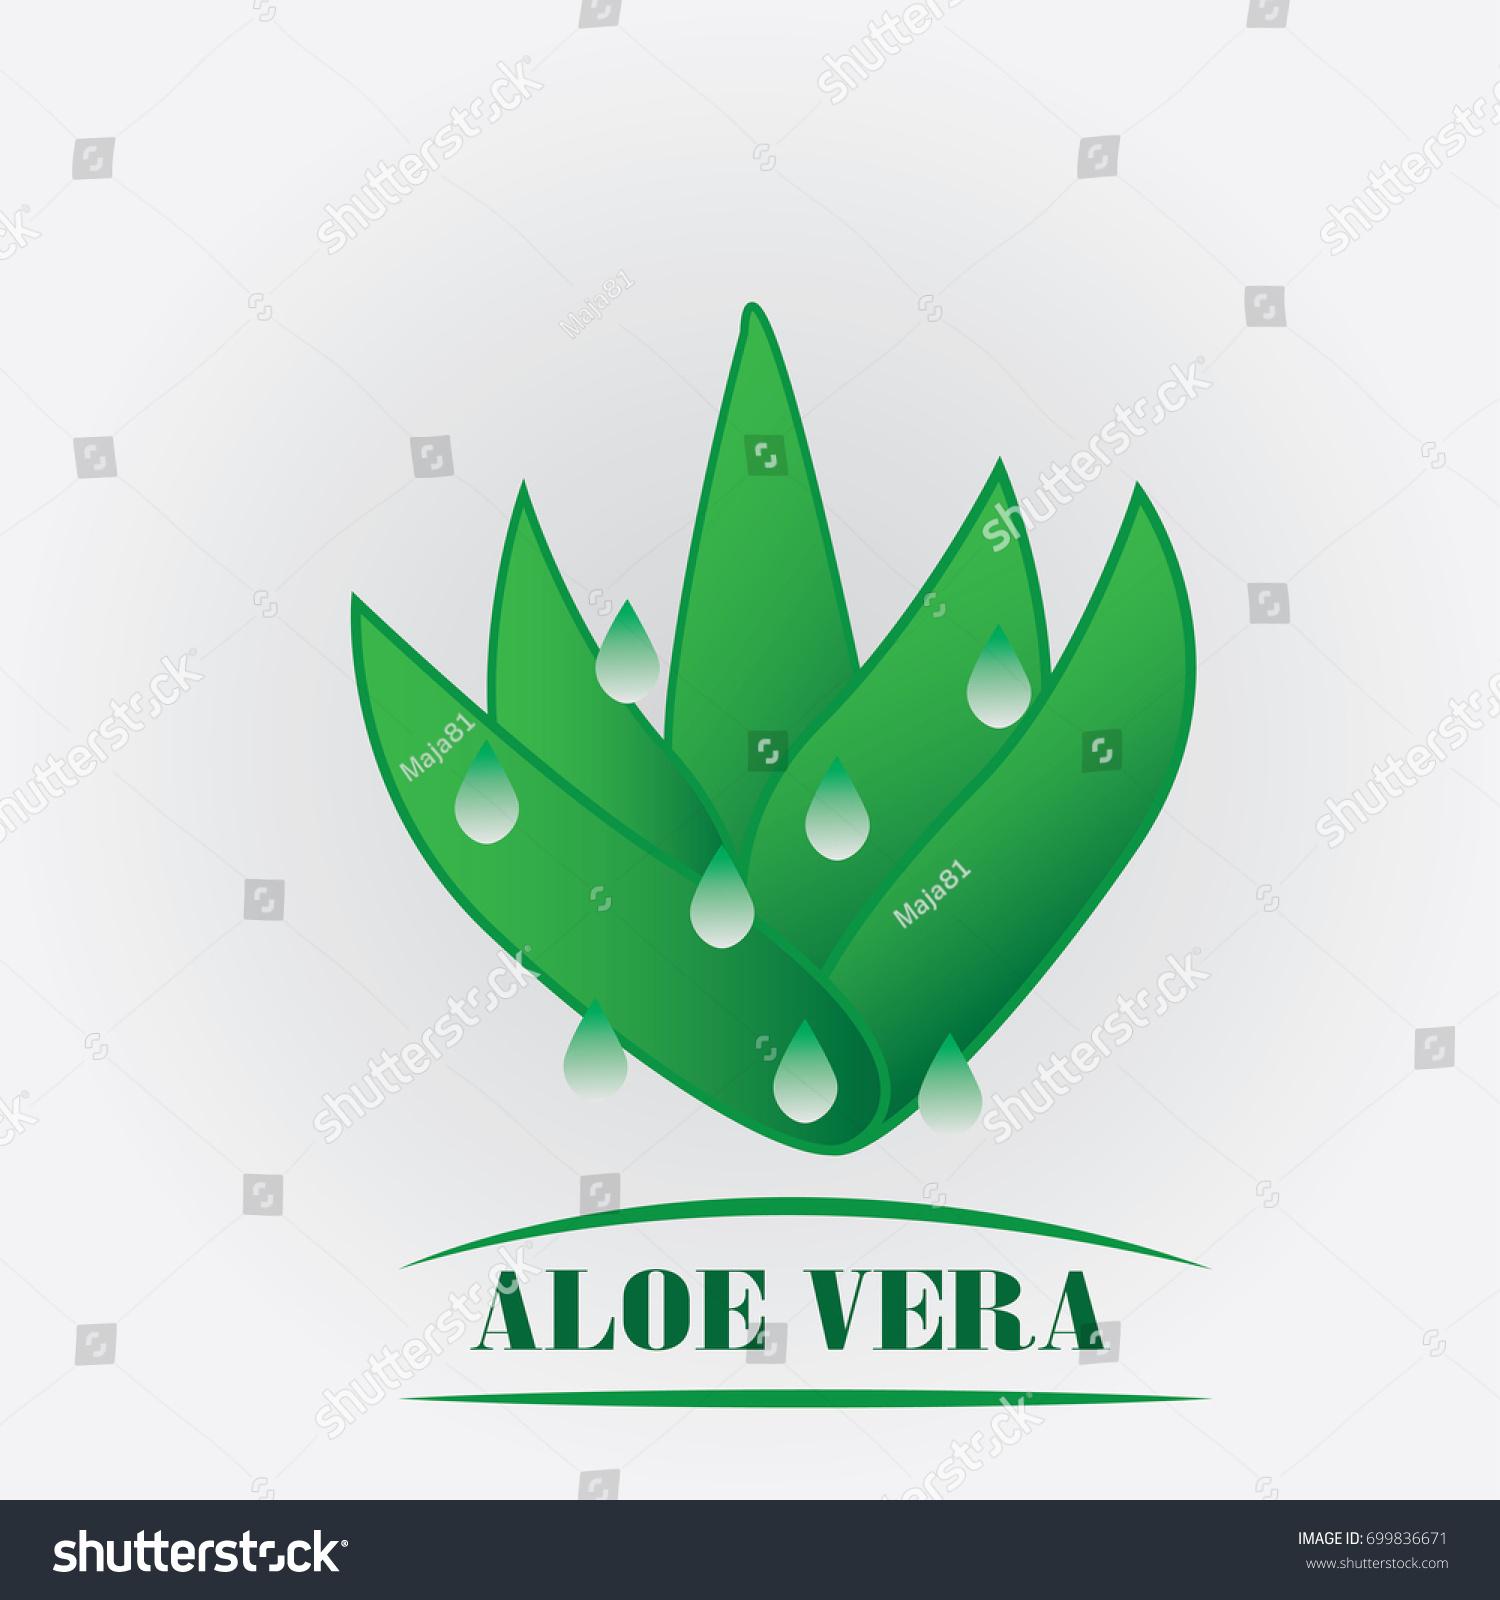 Etiket: Aloe Vera